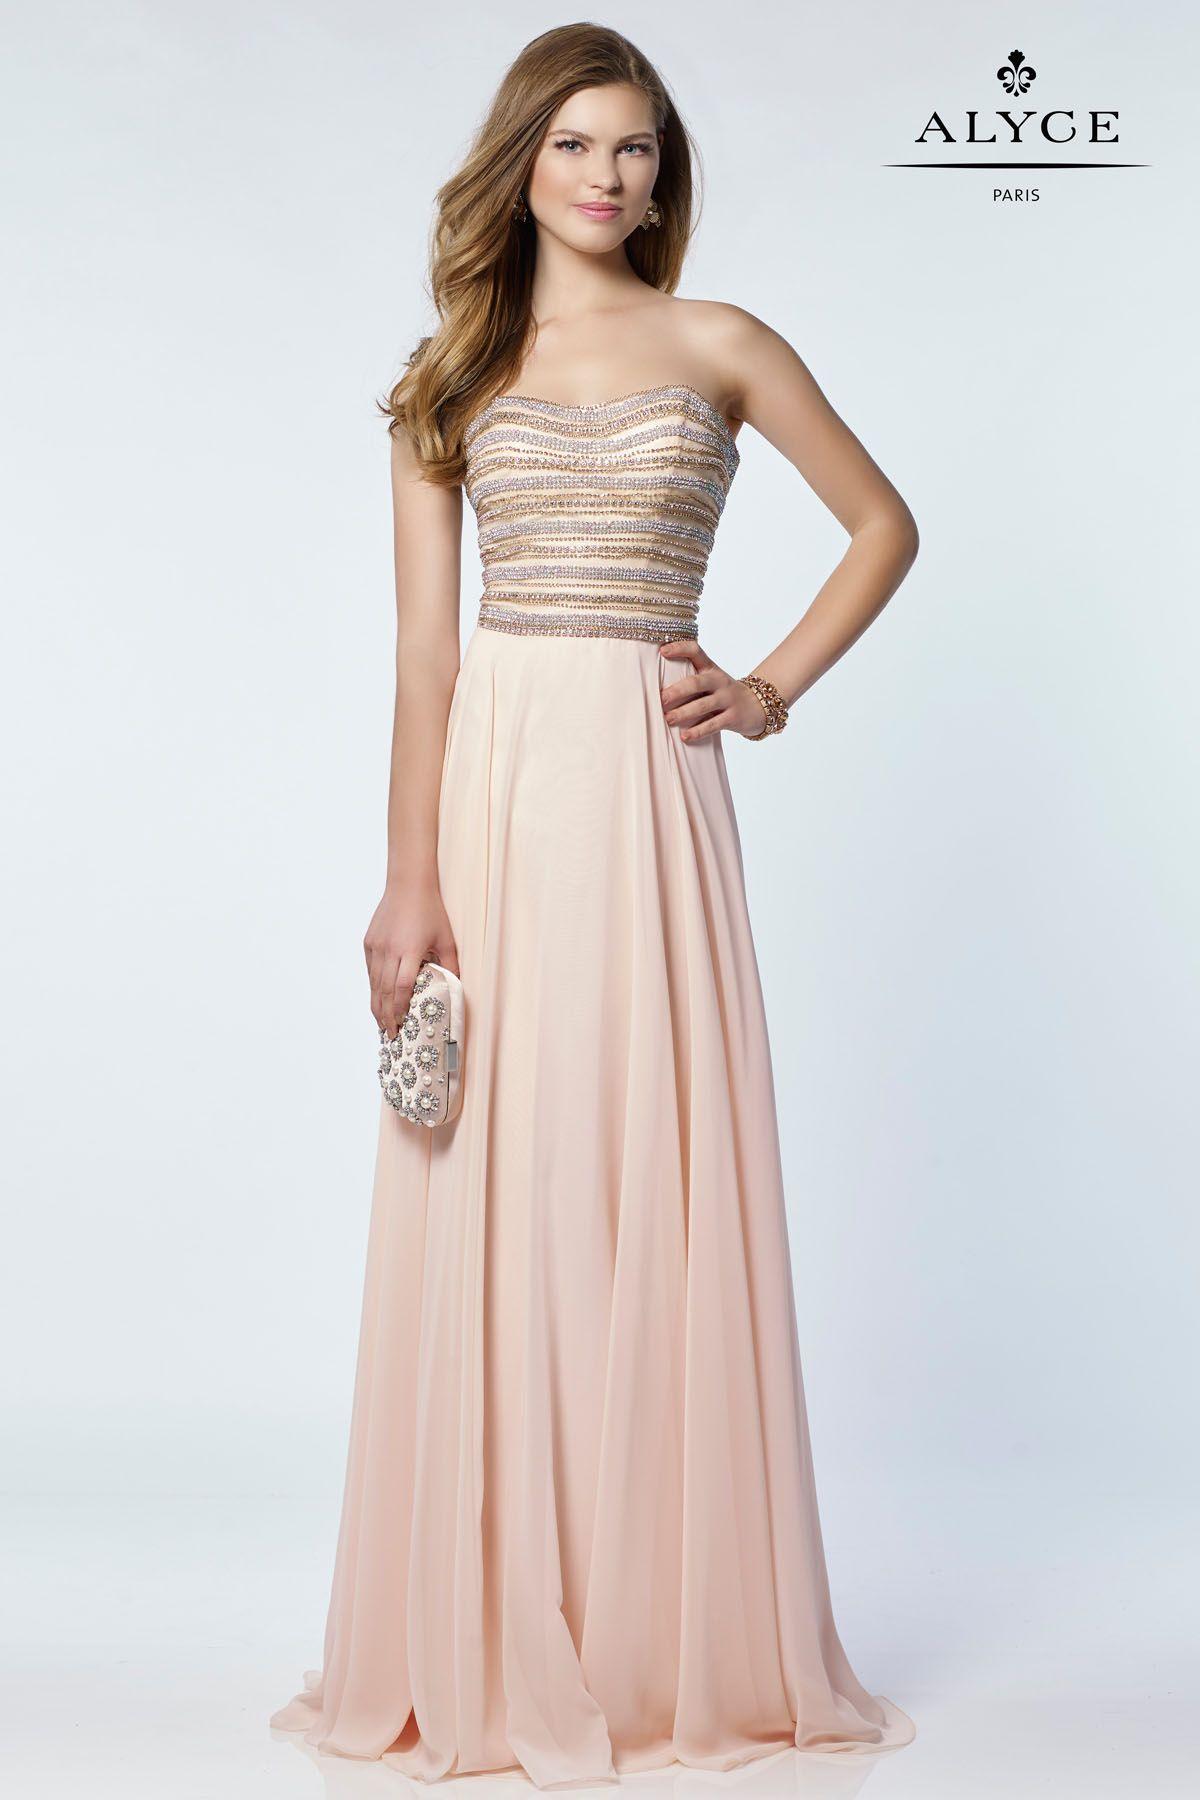 Alyce Paris 6690 Maxi dress wedding, Sweetheart prom